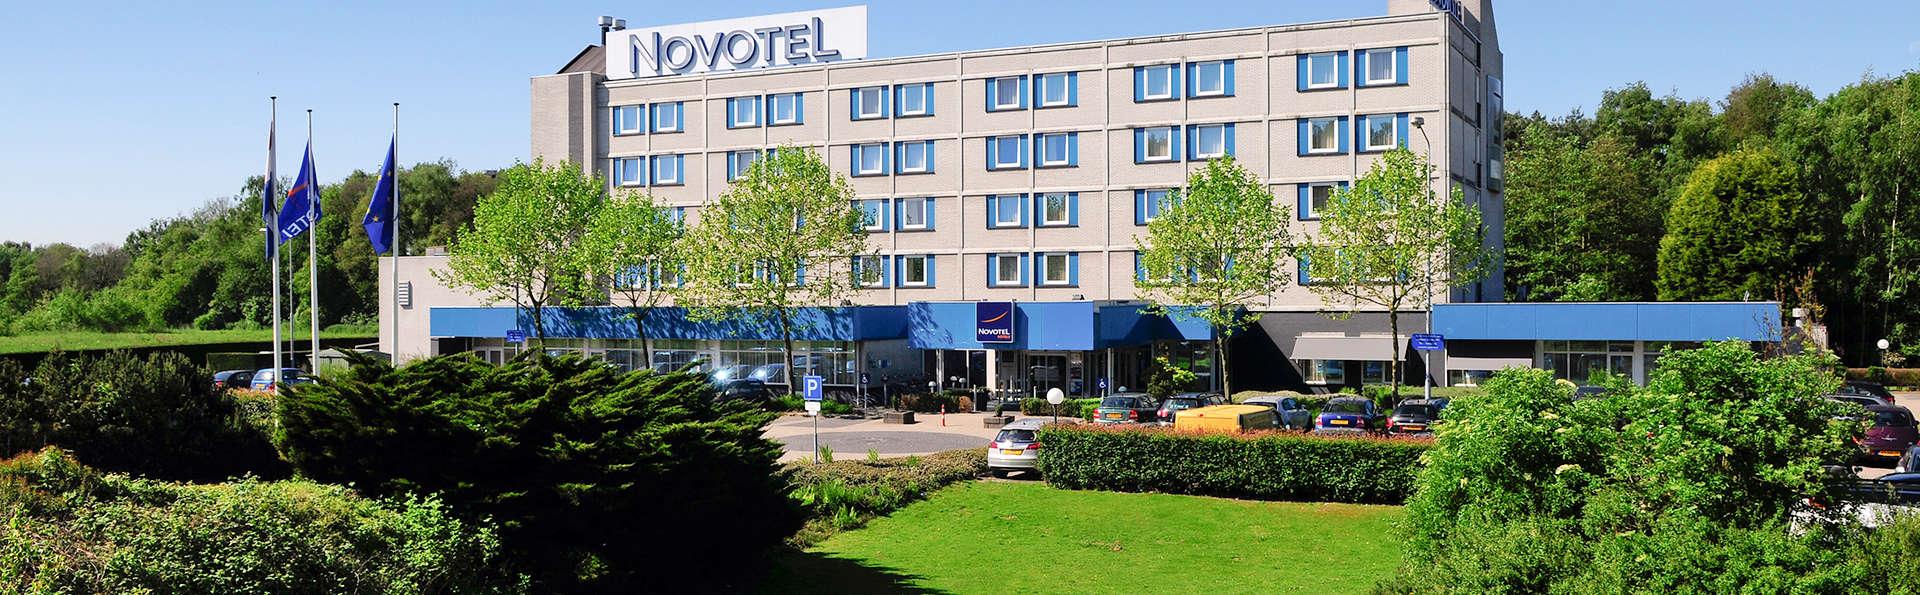 Novotel Eindhoven - EDIT_front.jpg